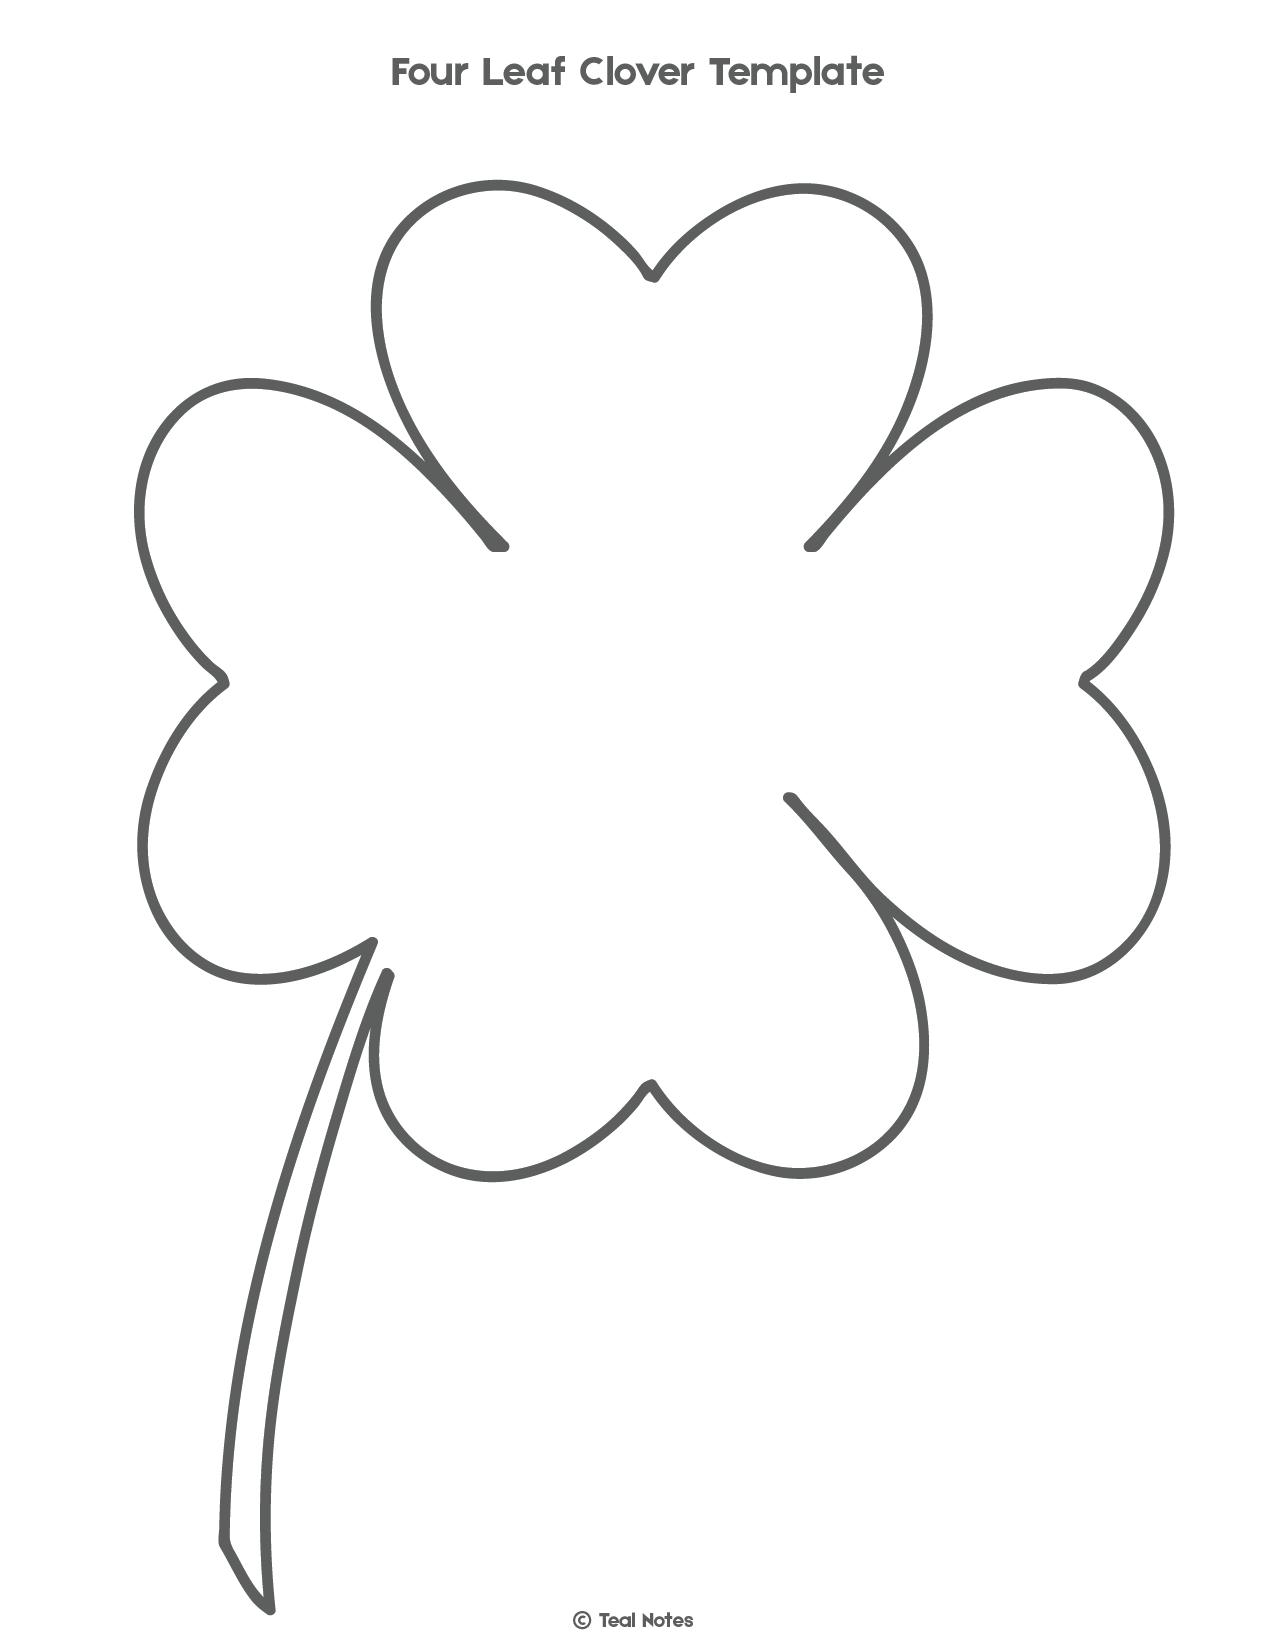 Four Leaf Clover Template: Free Shamrock Template Printable   Free - Four Leaf Clover Template Printable Free